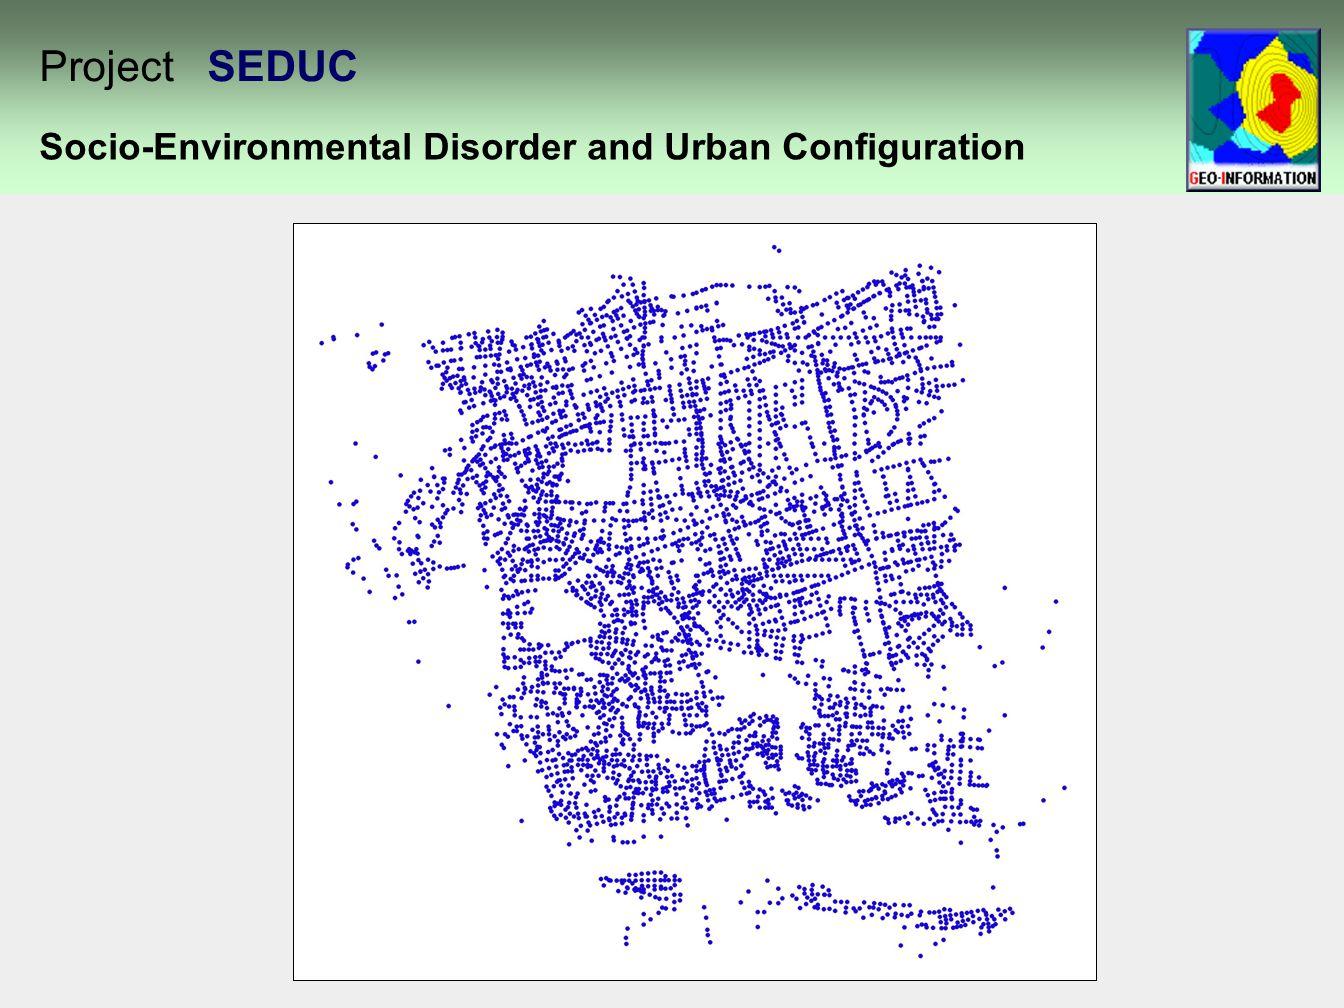 Socio-Environmental Disorder and Urban Configuration Project SEDUC